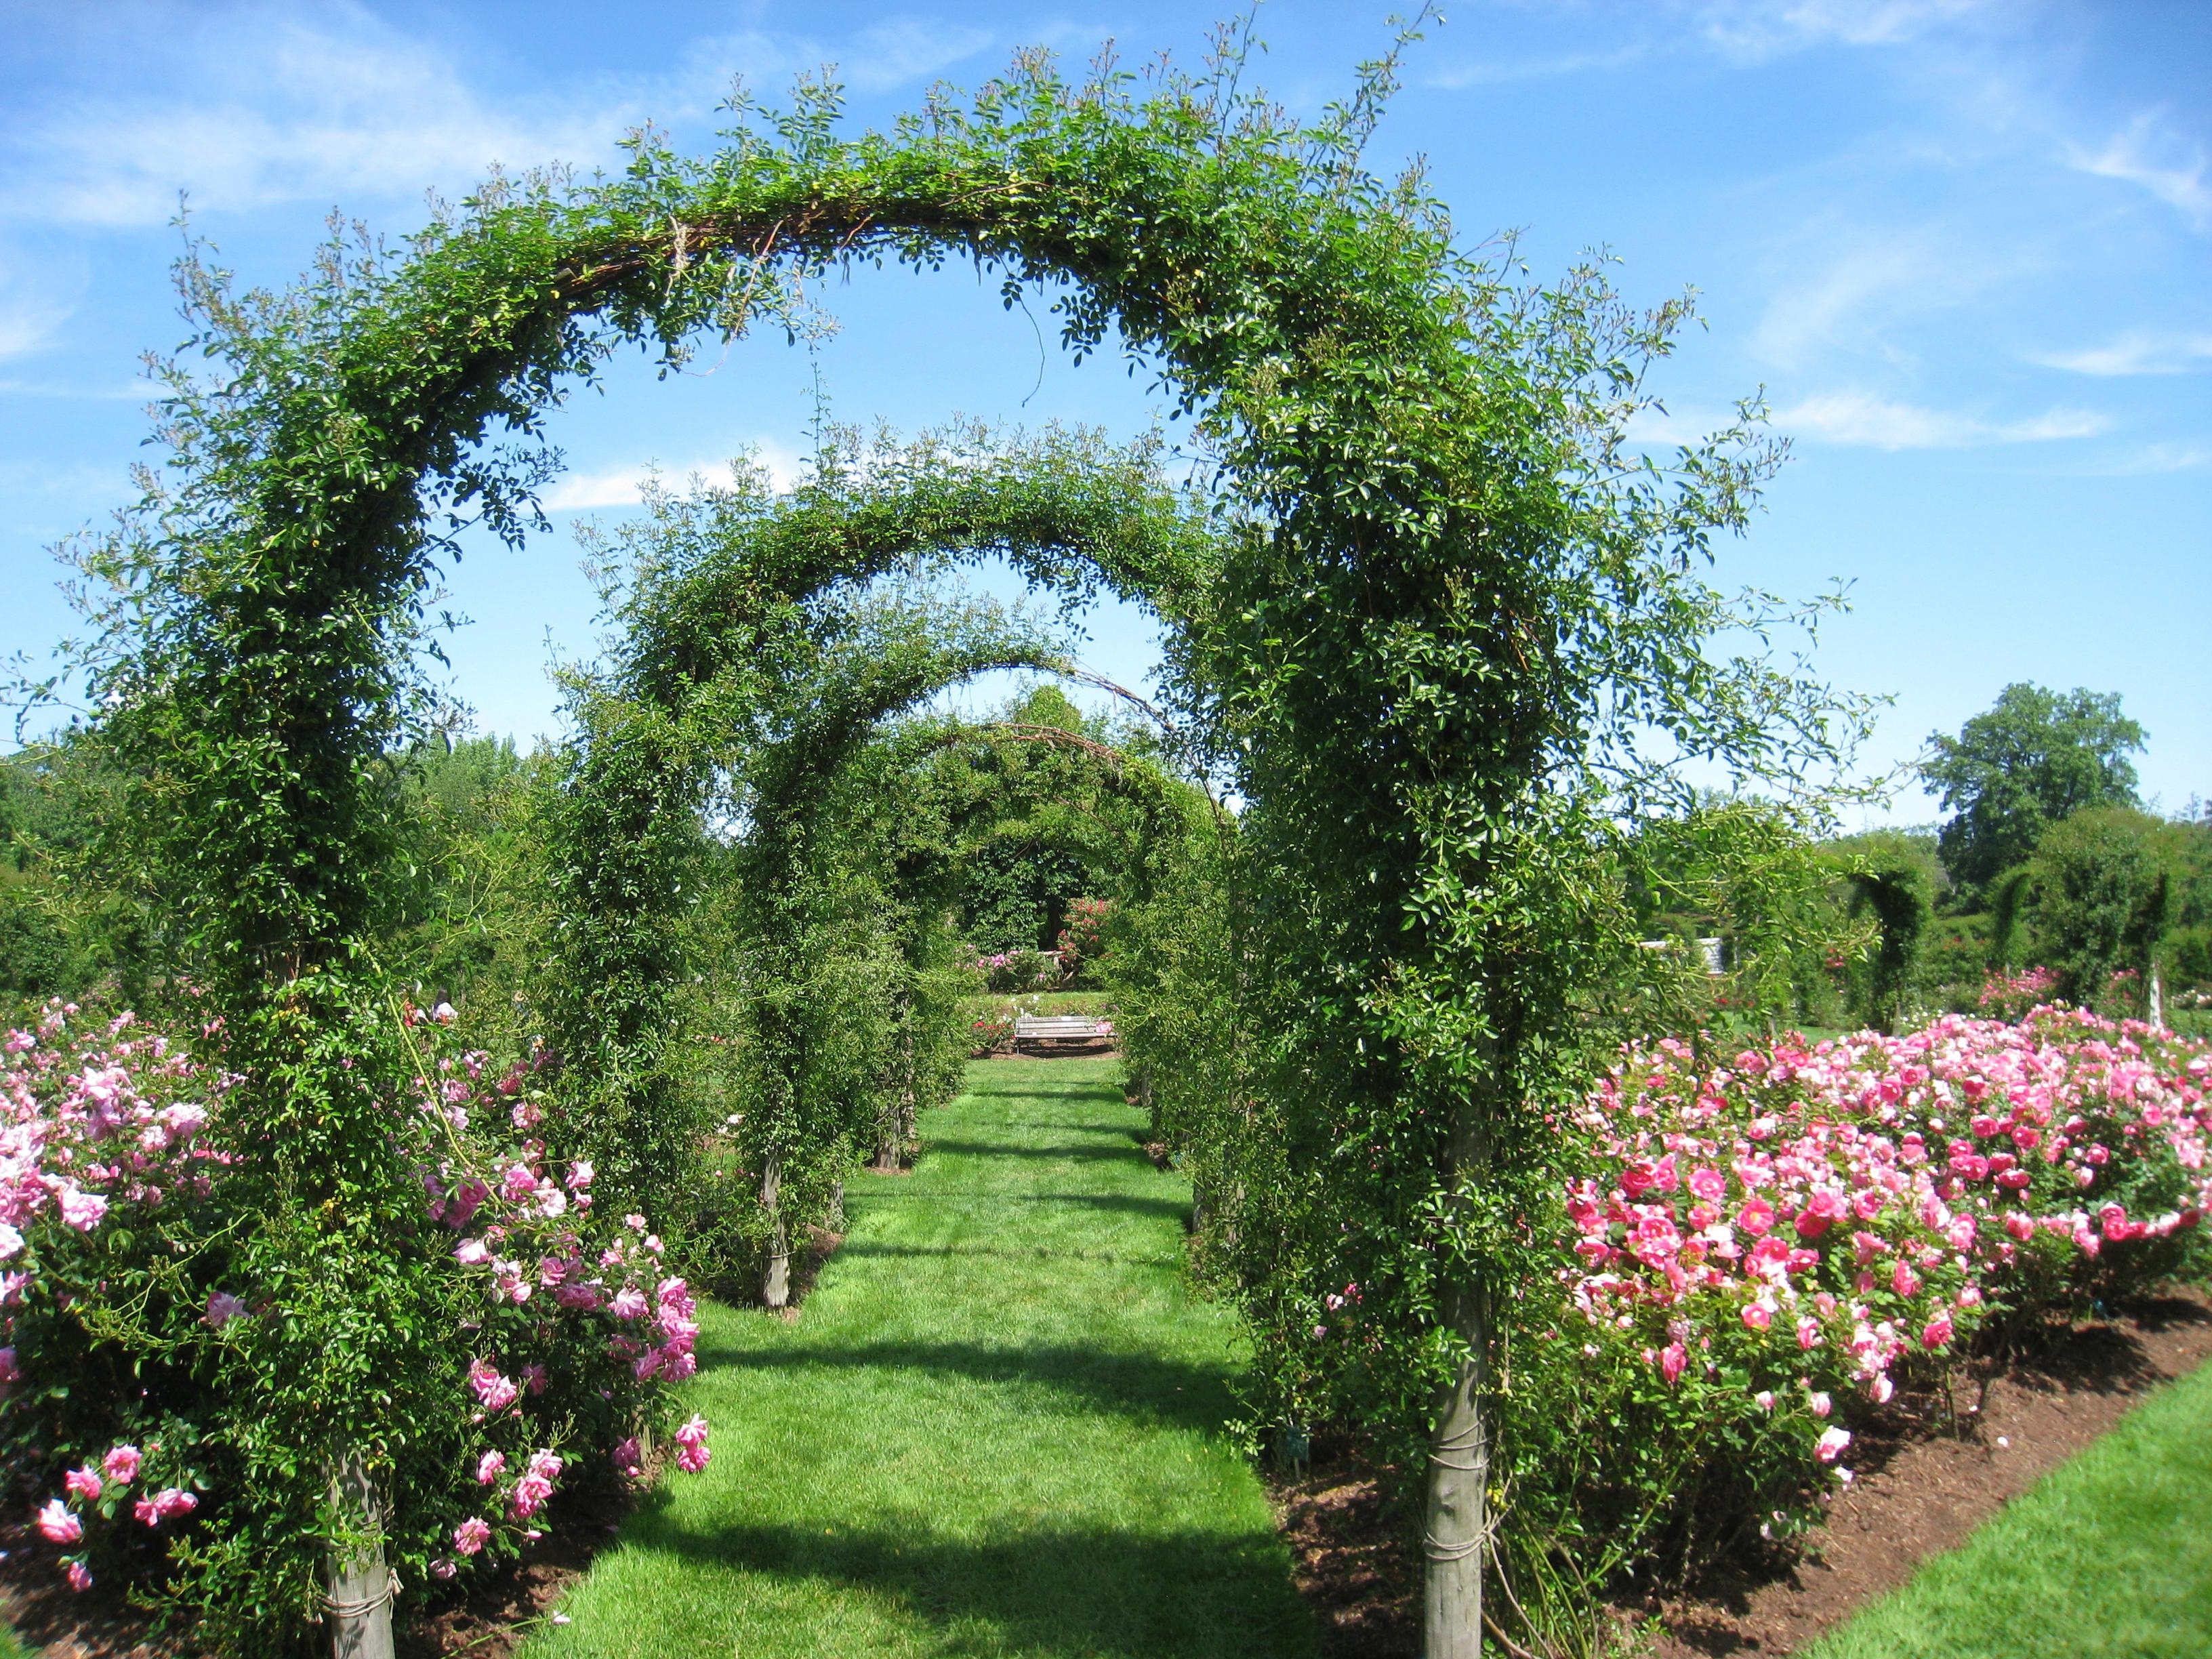 Description elizabeth park hartford ct rose garden 7